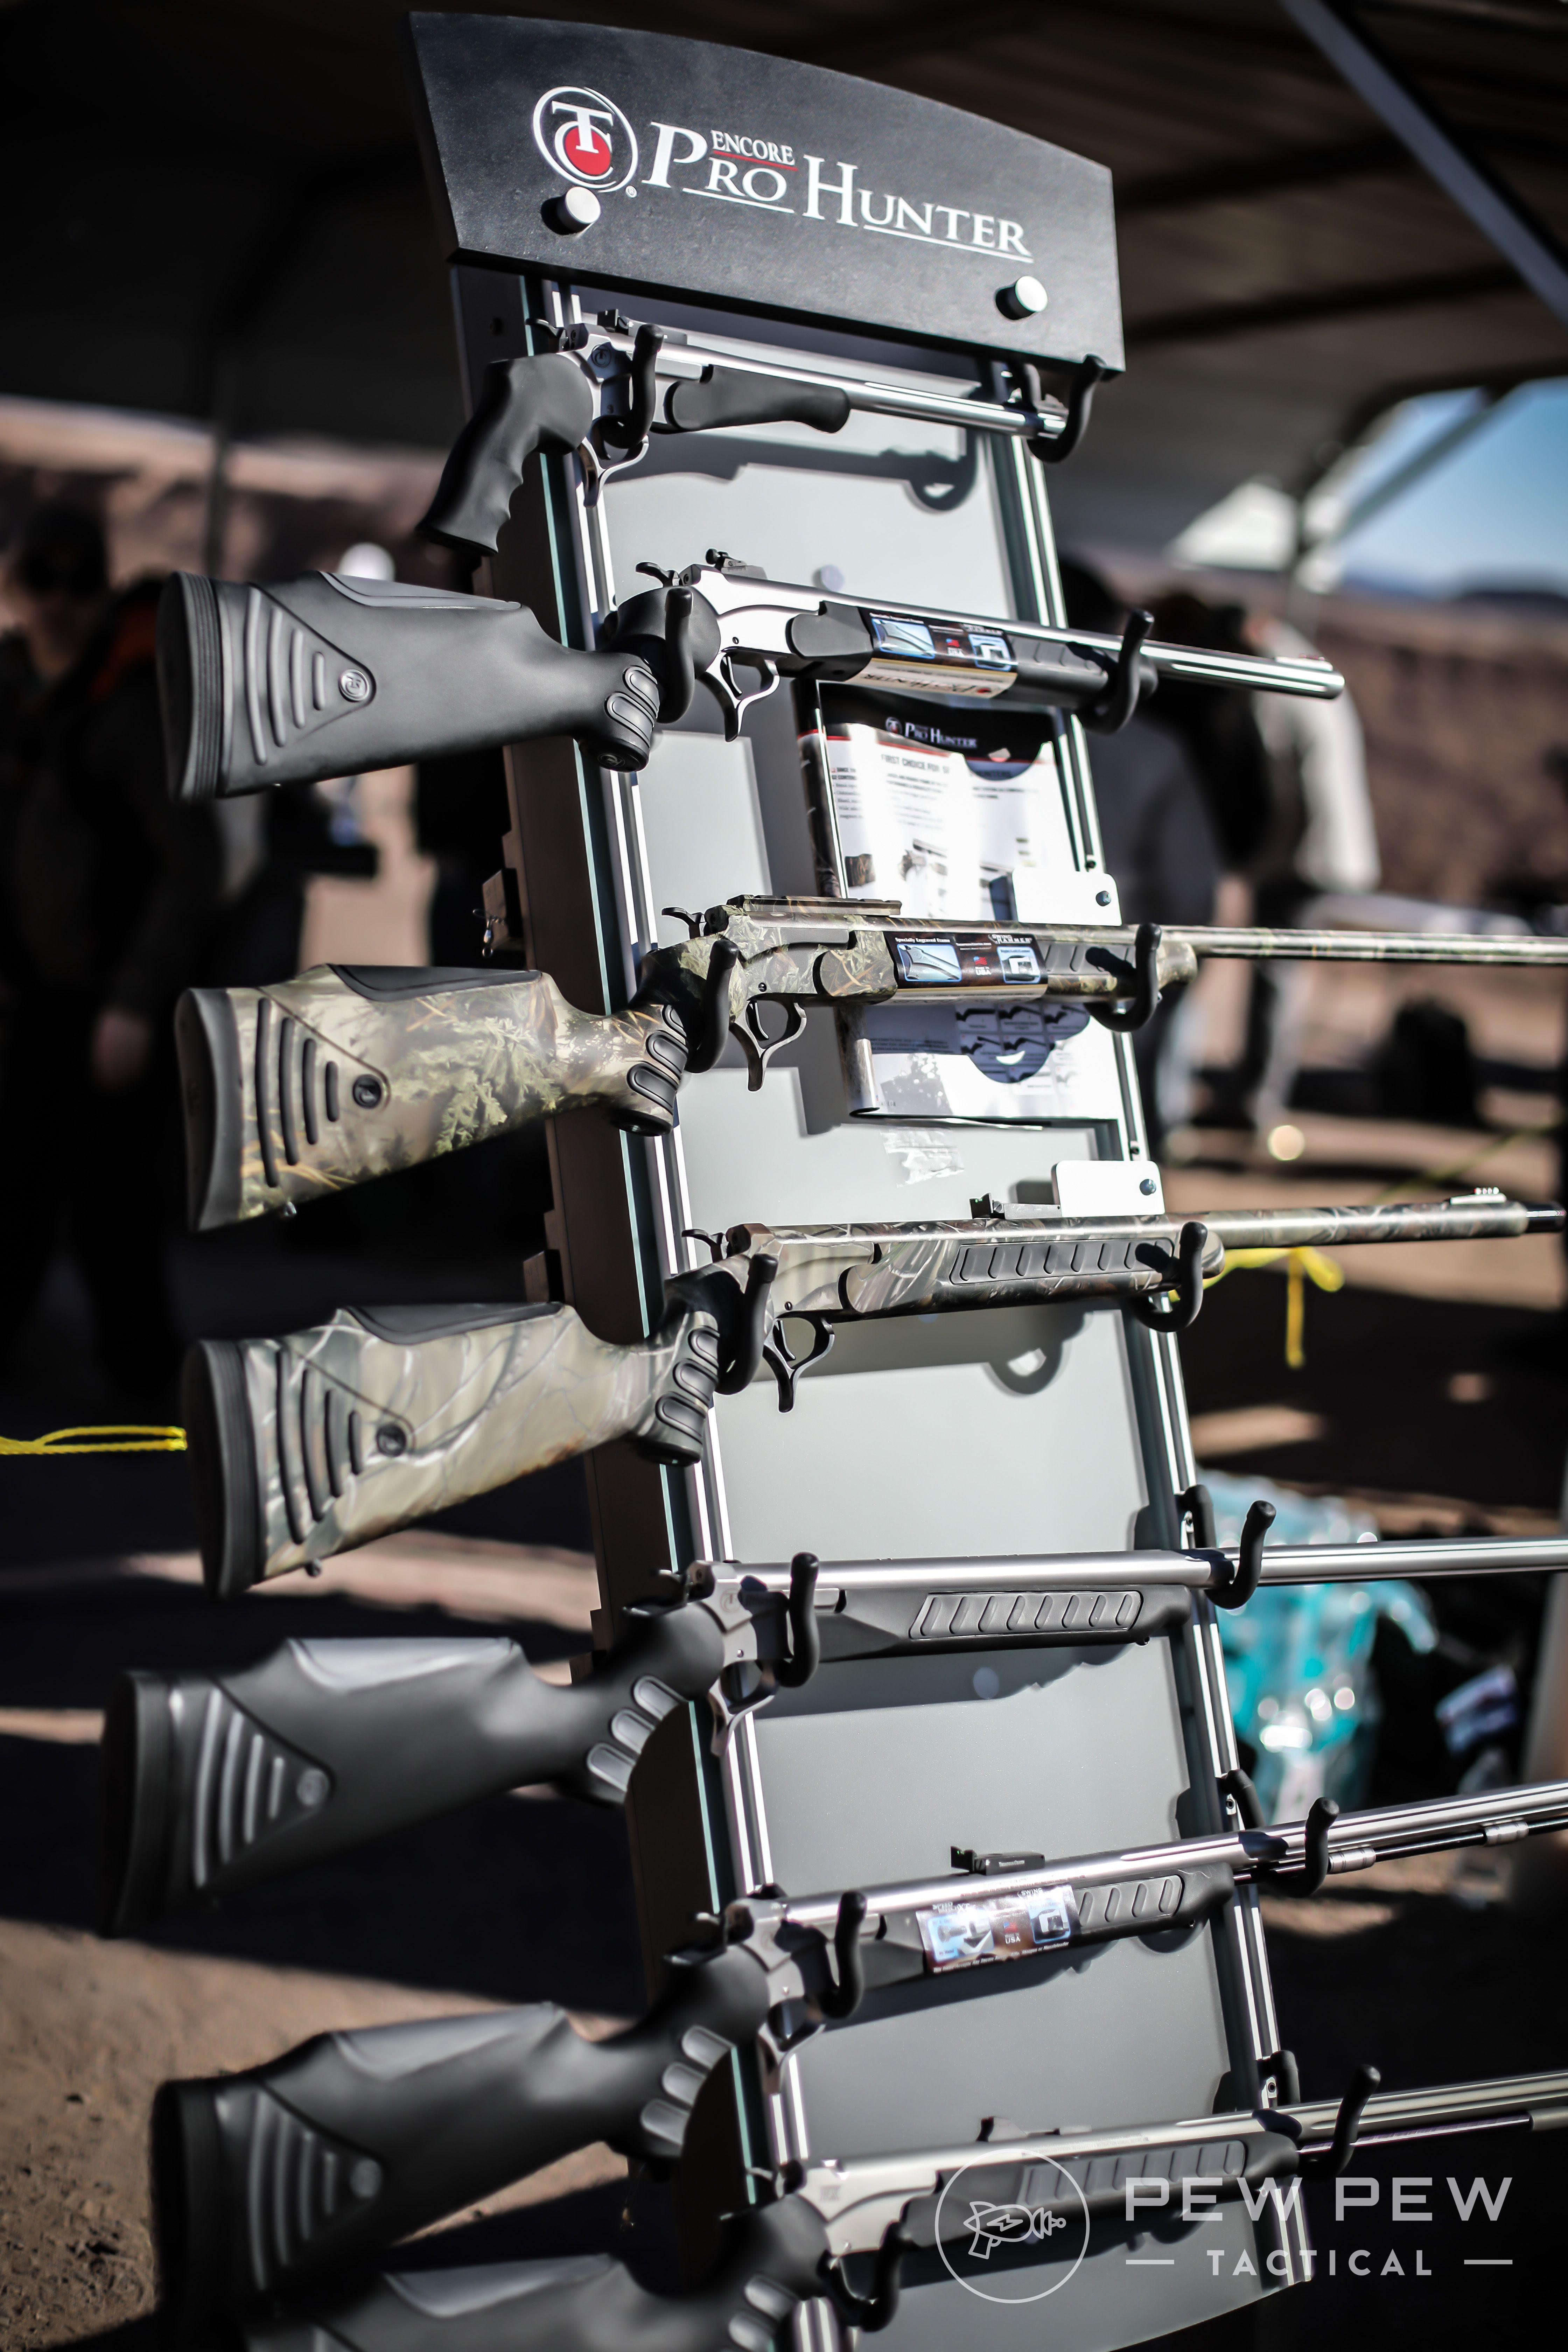 Best Beginner Hunting Rifles Hunting rifles, Hunting